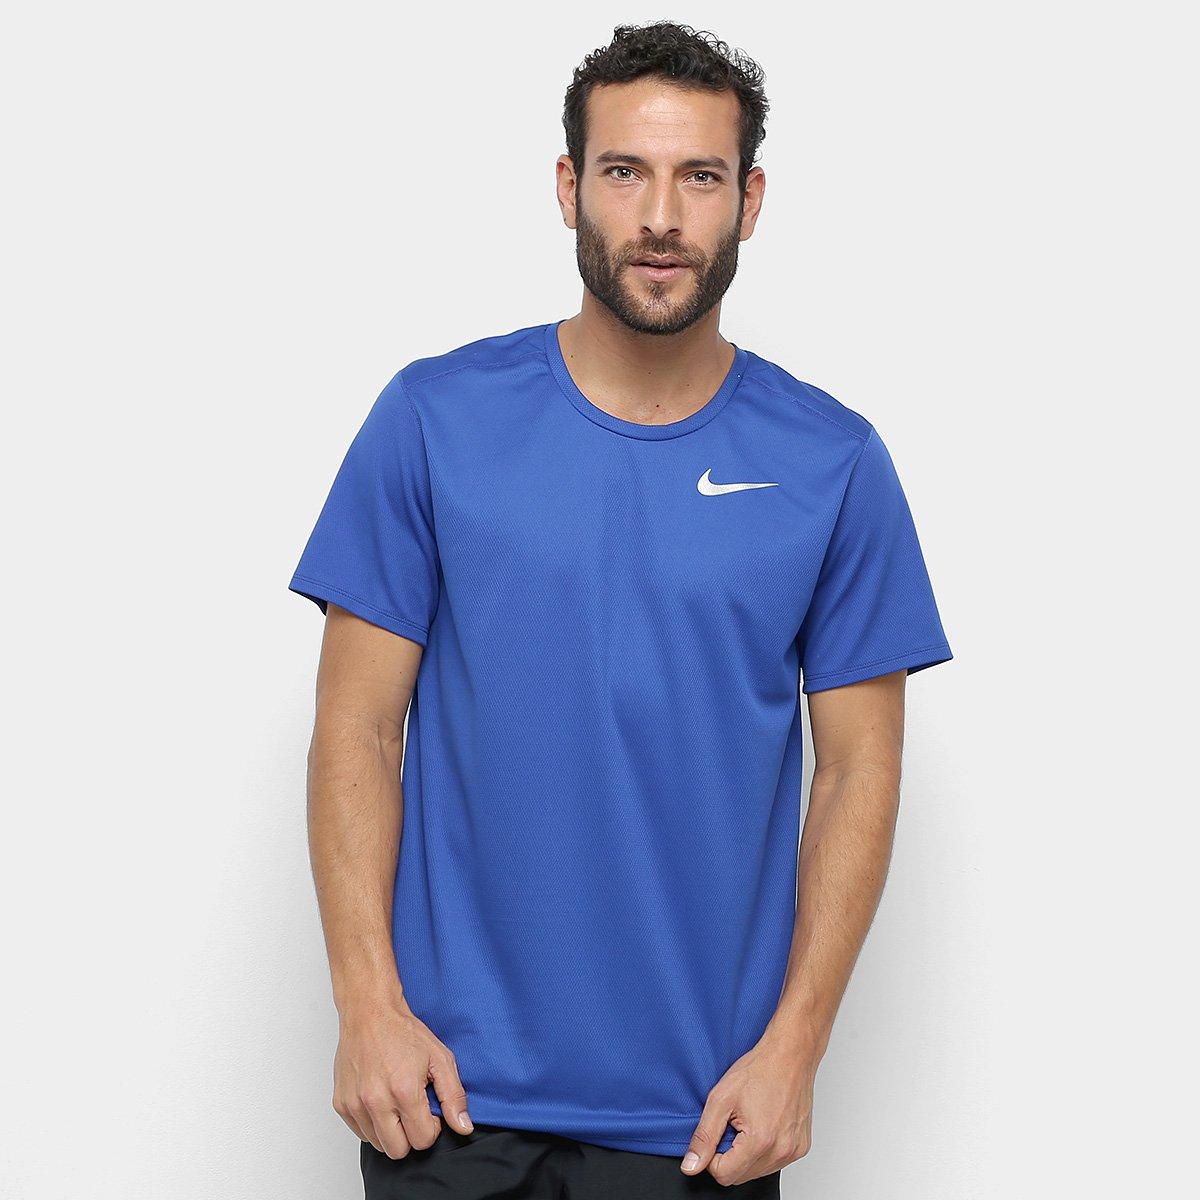 Camiseta Nike DRI-FIT Run Masculina - Tam: P